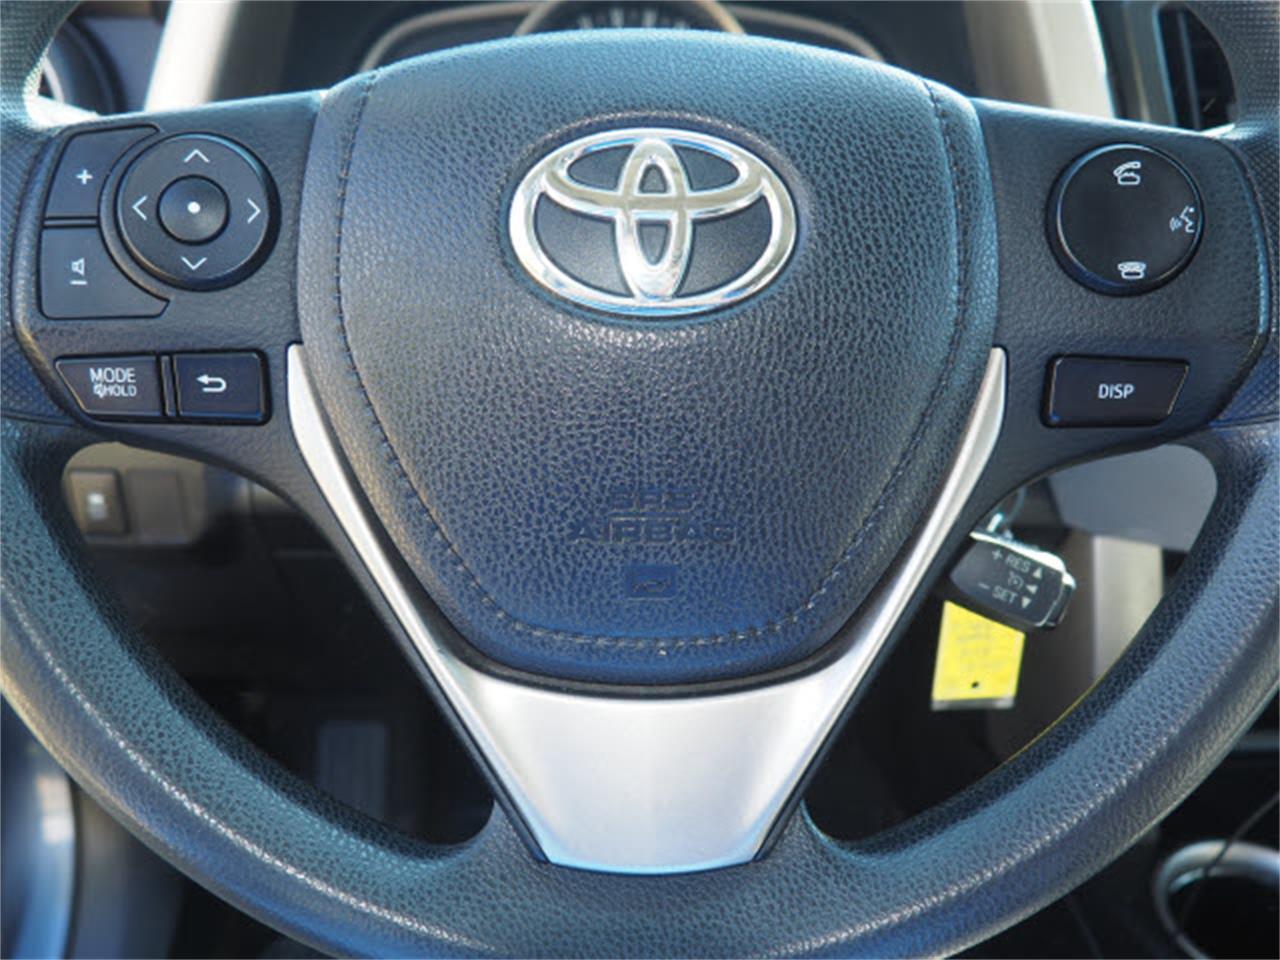 2014 Toyota Rav4 (CC-1423743) for sale in Marysville, Ohio